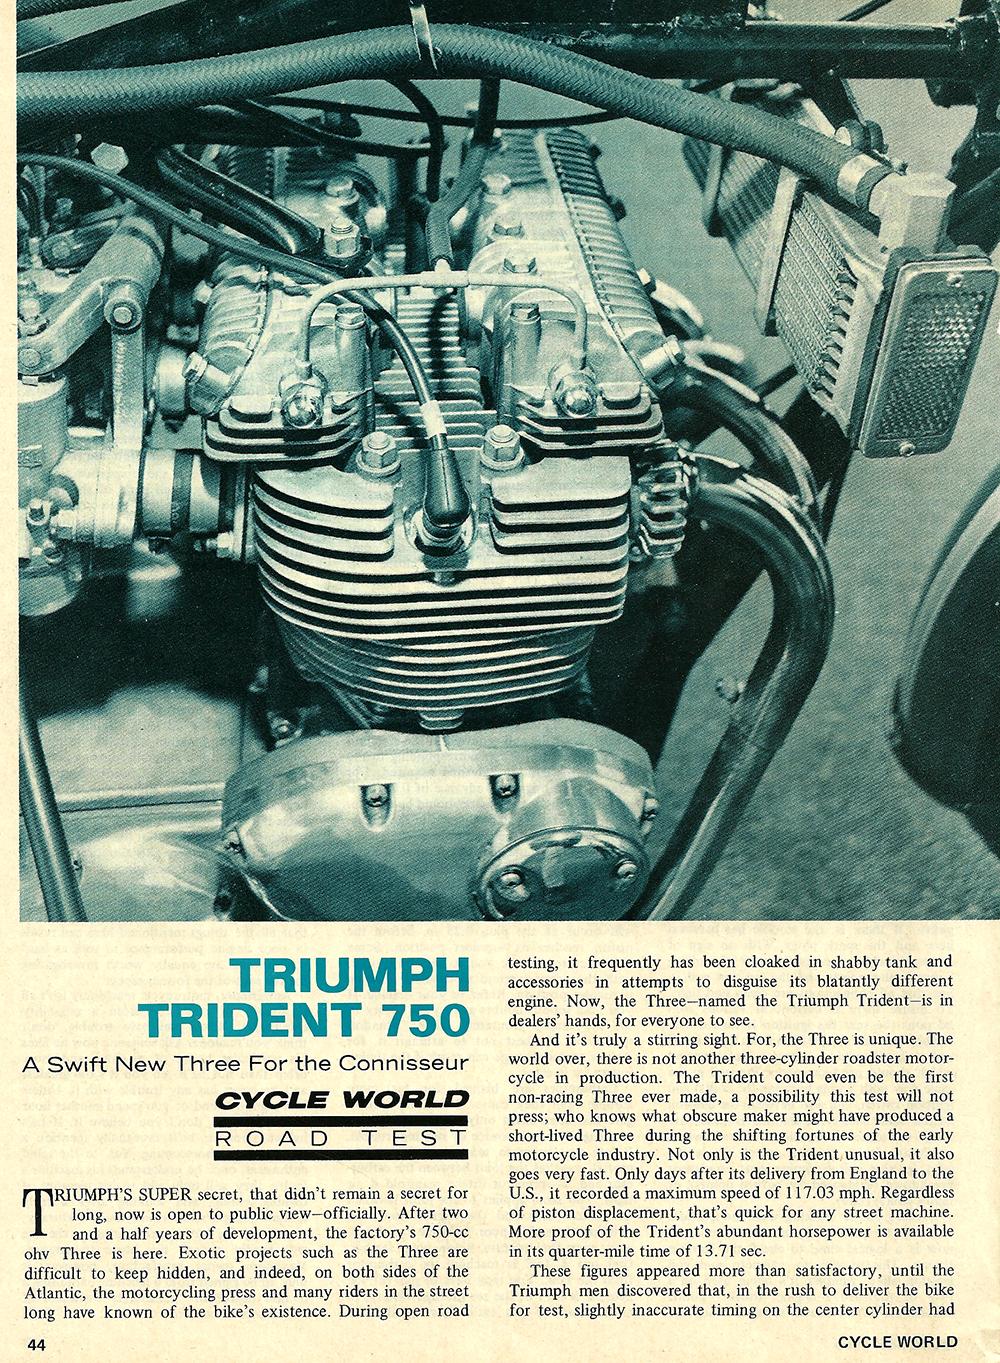 1968 Triumph Trident 750 road test 01.jpg